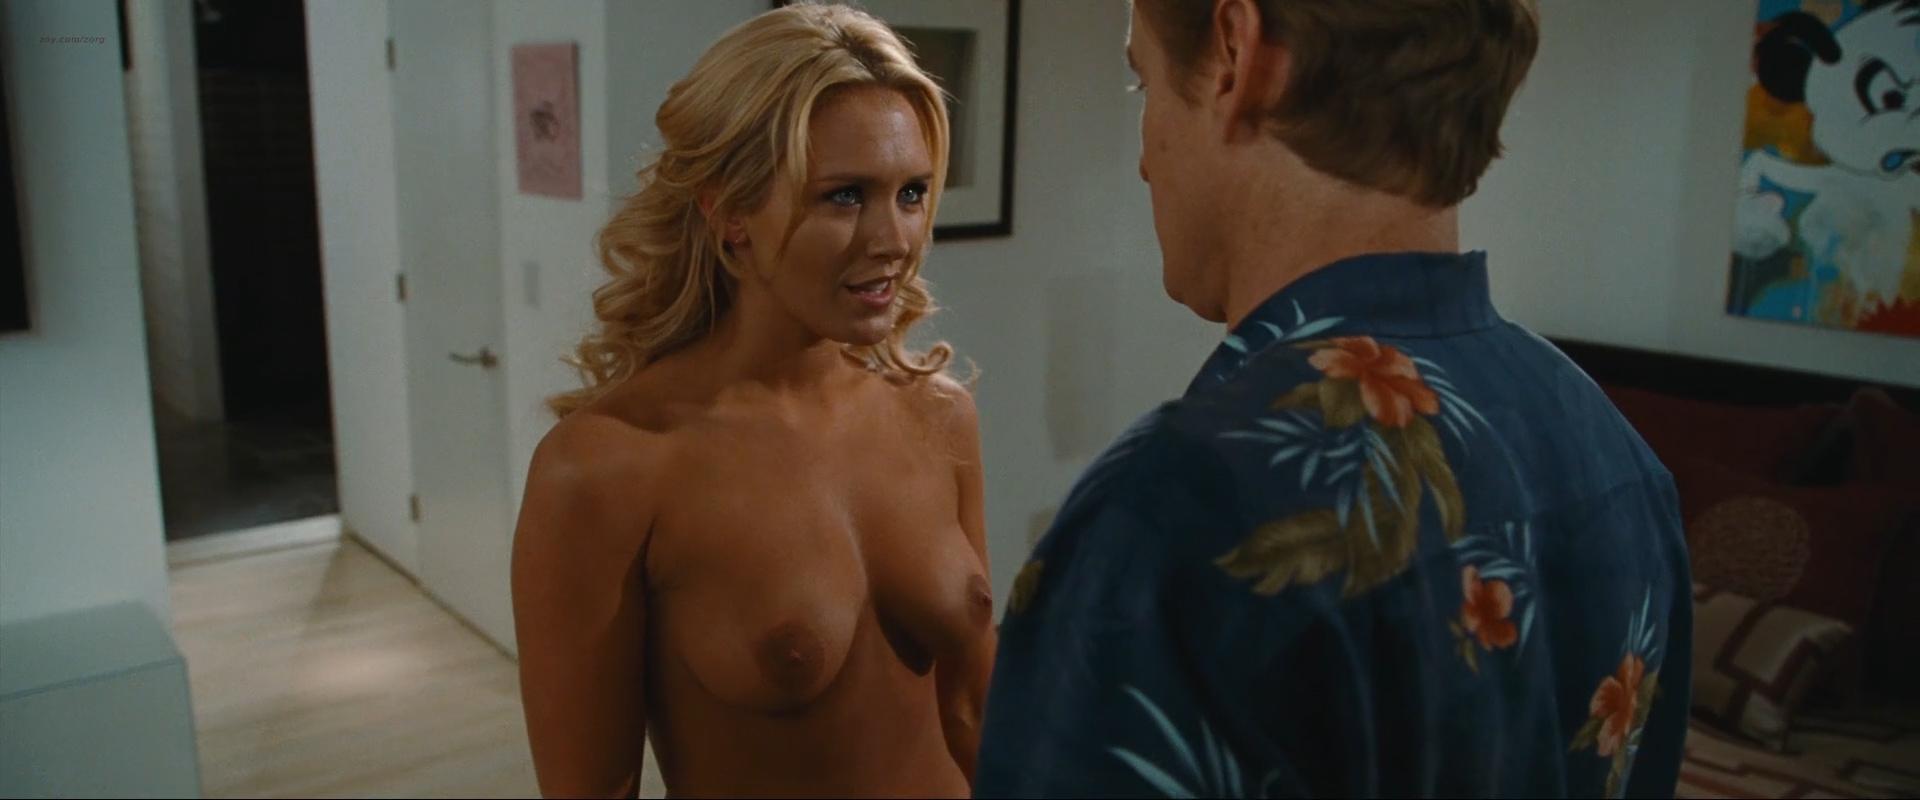 Alexandra Doyle Porn nicky whelan nude topless alexandra daddario hot - hall pass